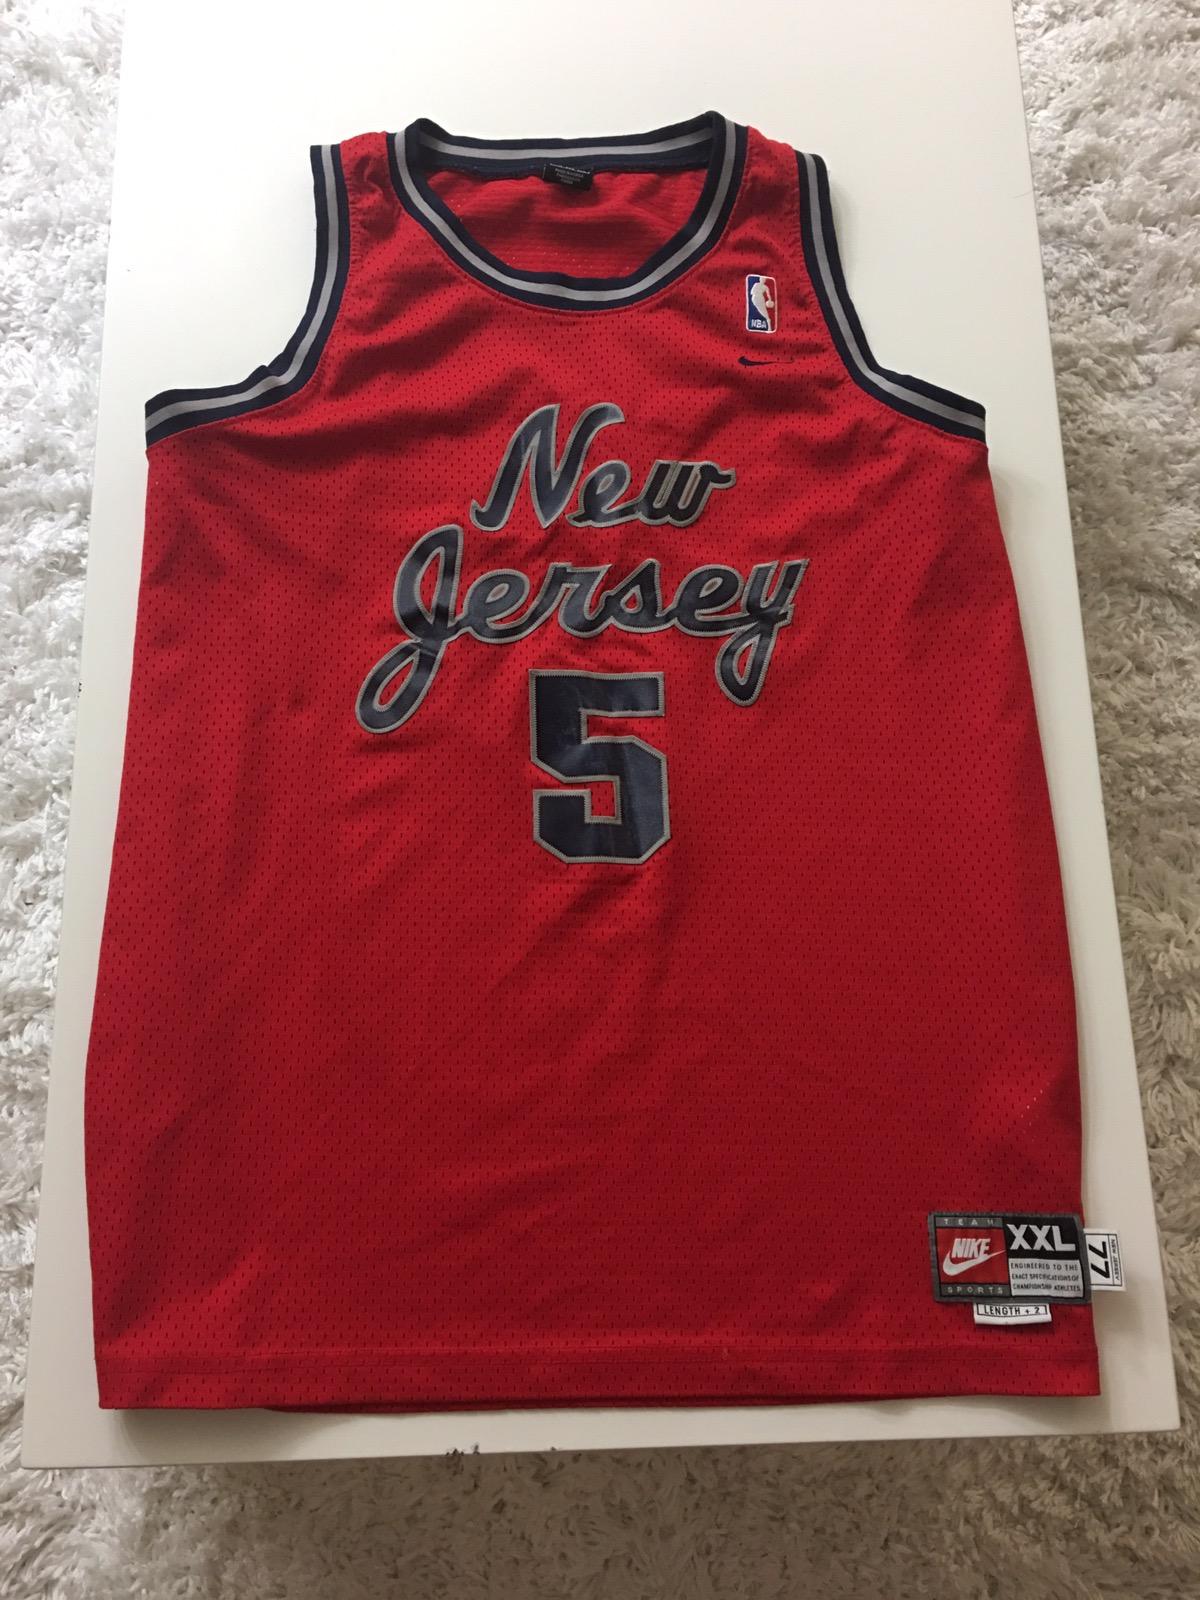 7eab611209b Nike New Jersey Nets Jason Kidd Red Nike Nba Basketball Jersey 2xl Xxl Rare  90s Vintage | Grailed